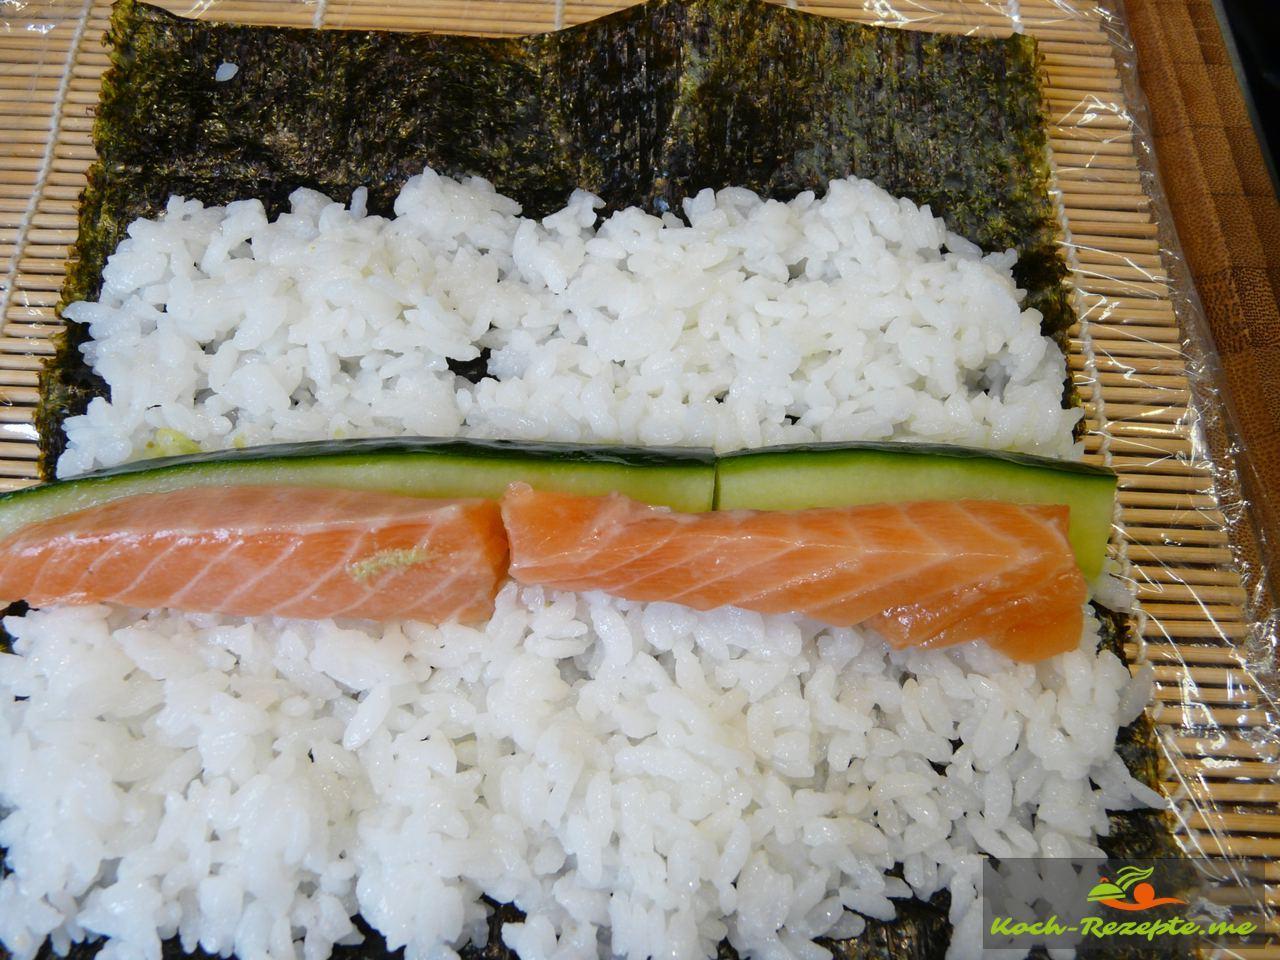 sushi reis kochen rezept anleitung mit fotos. Black Bedroom Furniture Sets. Home Design Ideas